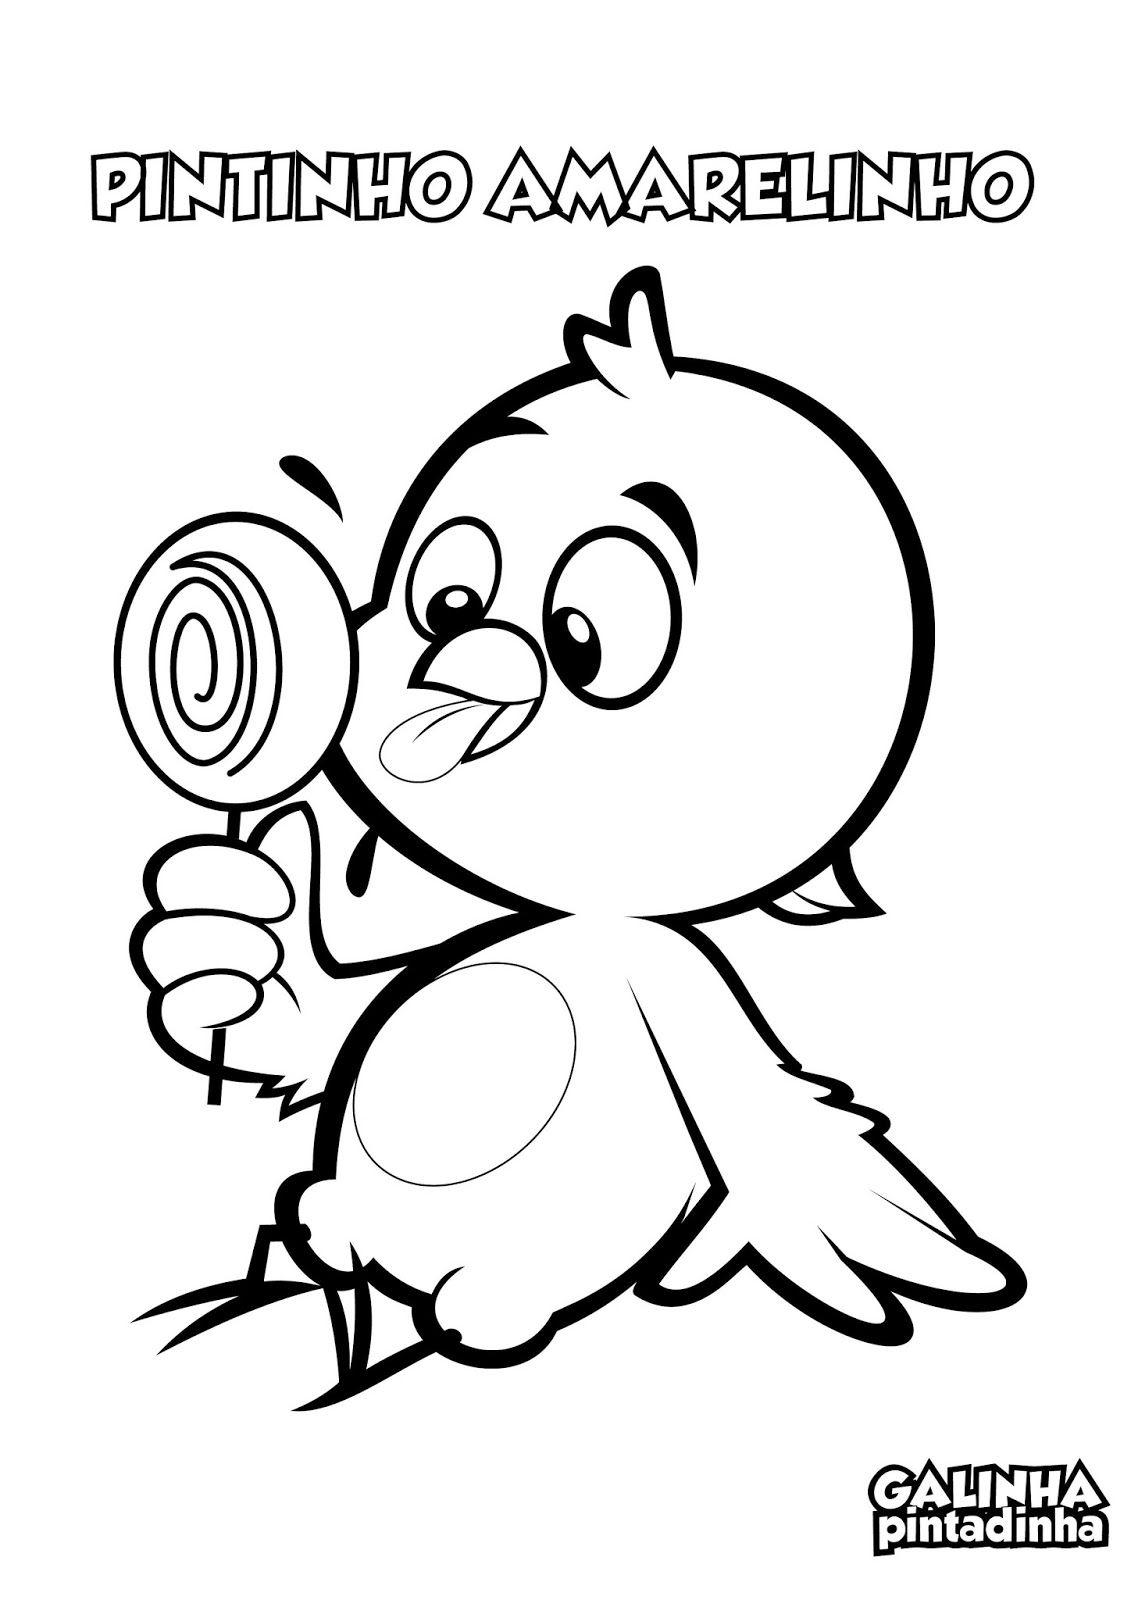 galinha-pintadinha-desenhos-imprimir-pintar-colorir-pintinho ...